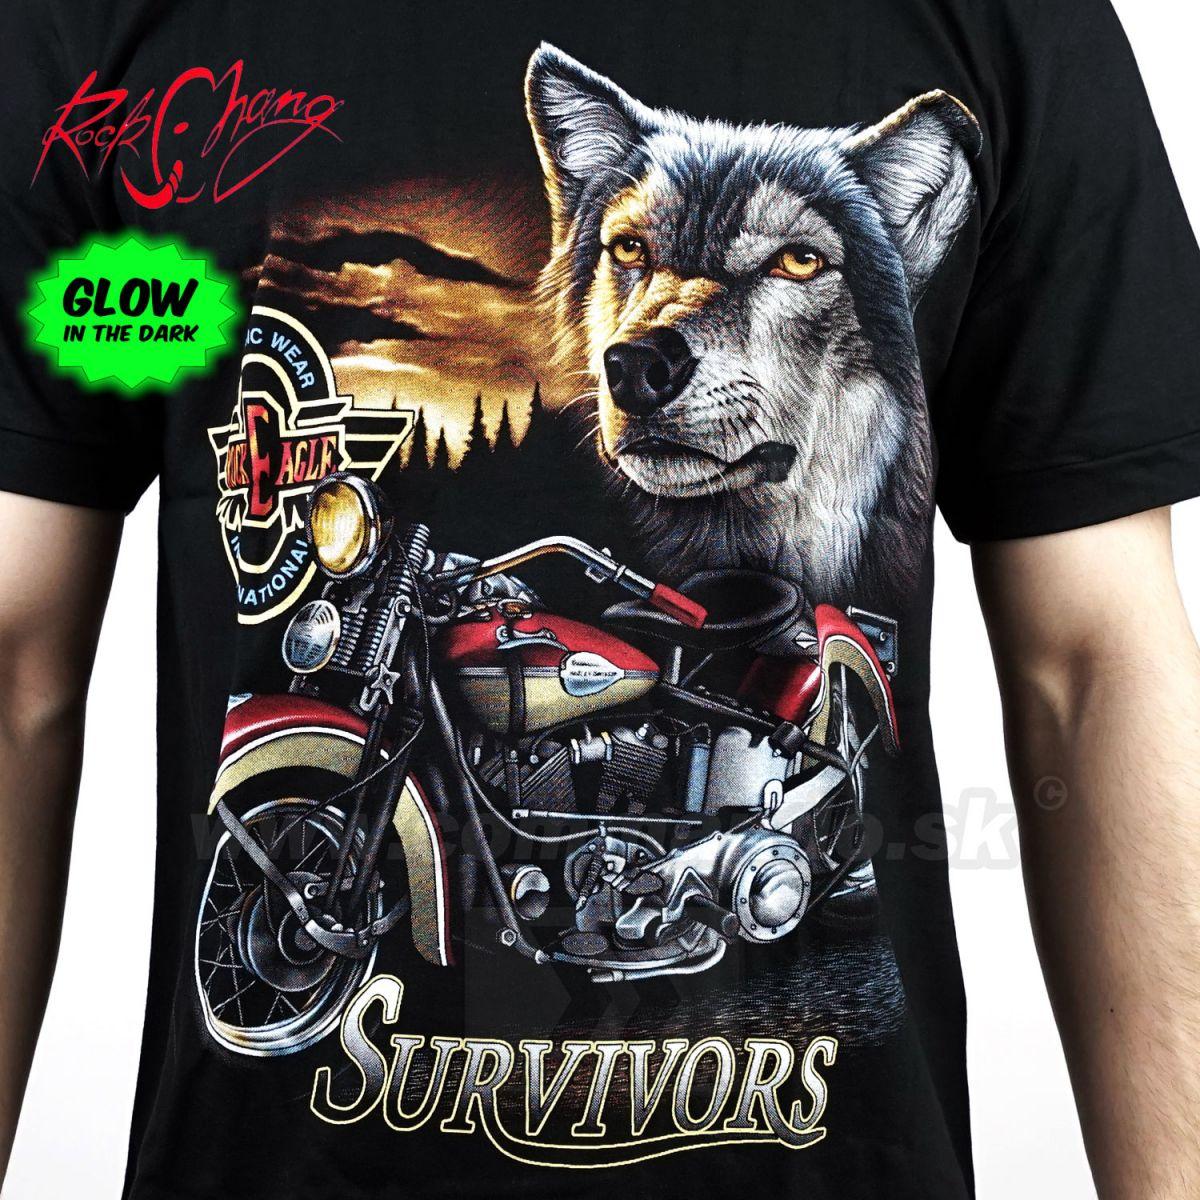 5aa3be6bbf49 Tričko Survivor Rock Eagle Rock Chang 3509 Motorcycle TShirt ...